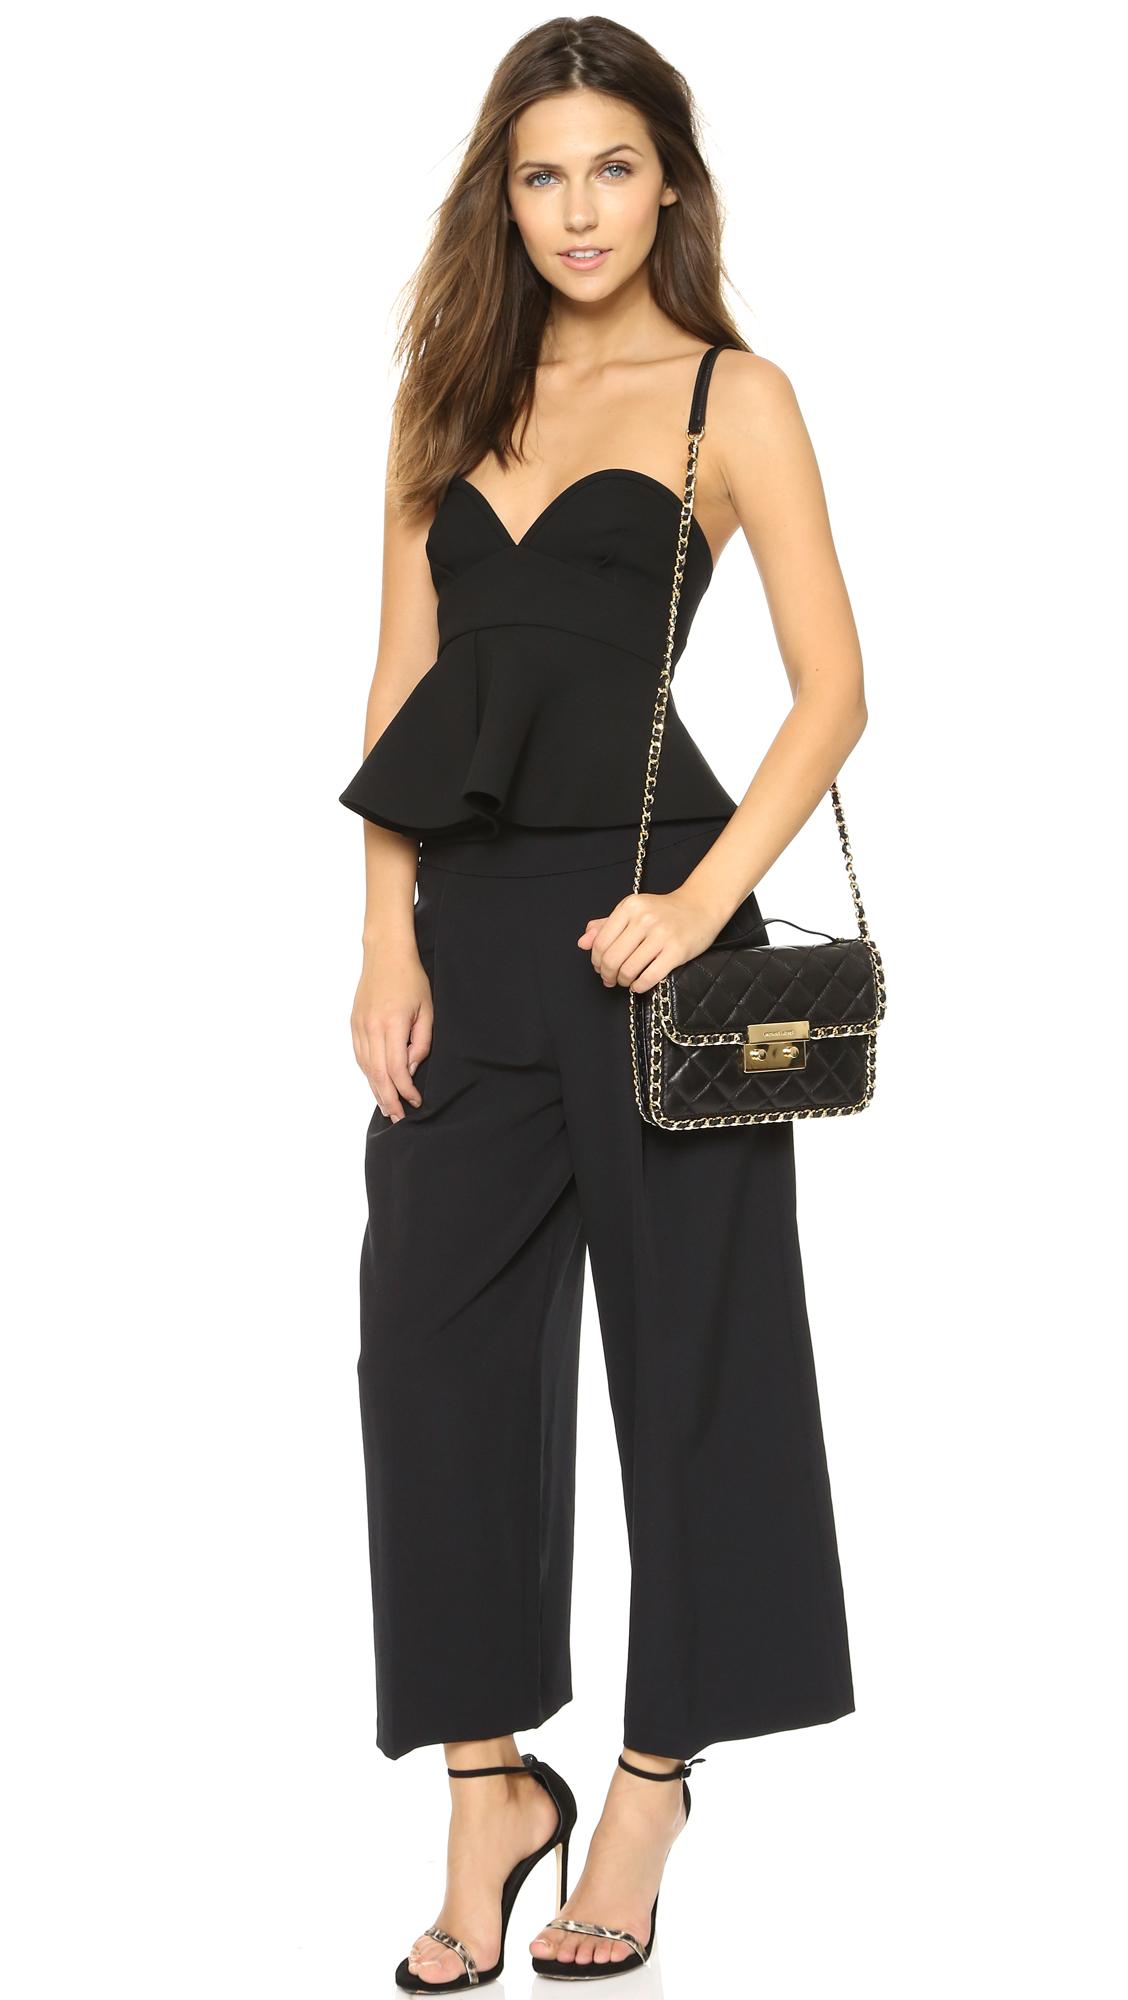 f10e92add50e Buy michael kors carine large shoulder bag > OFF37% Discounted